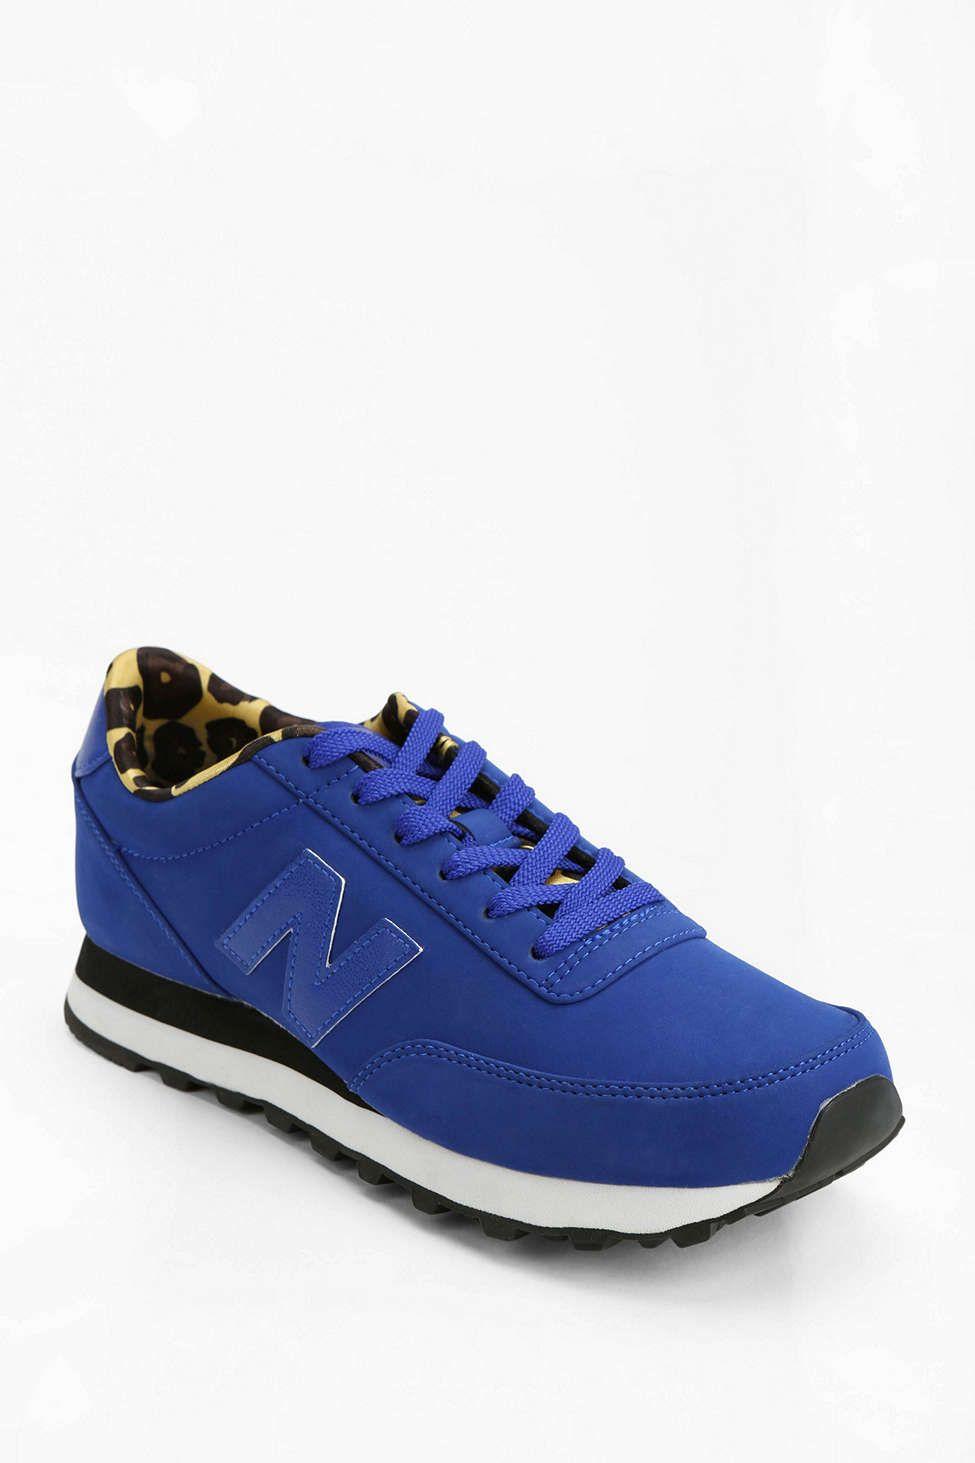 af96a8dc63bf New Balance 574 High Roller Running Sneaker